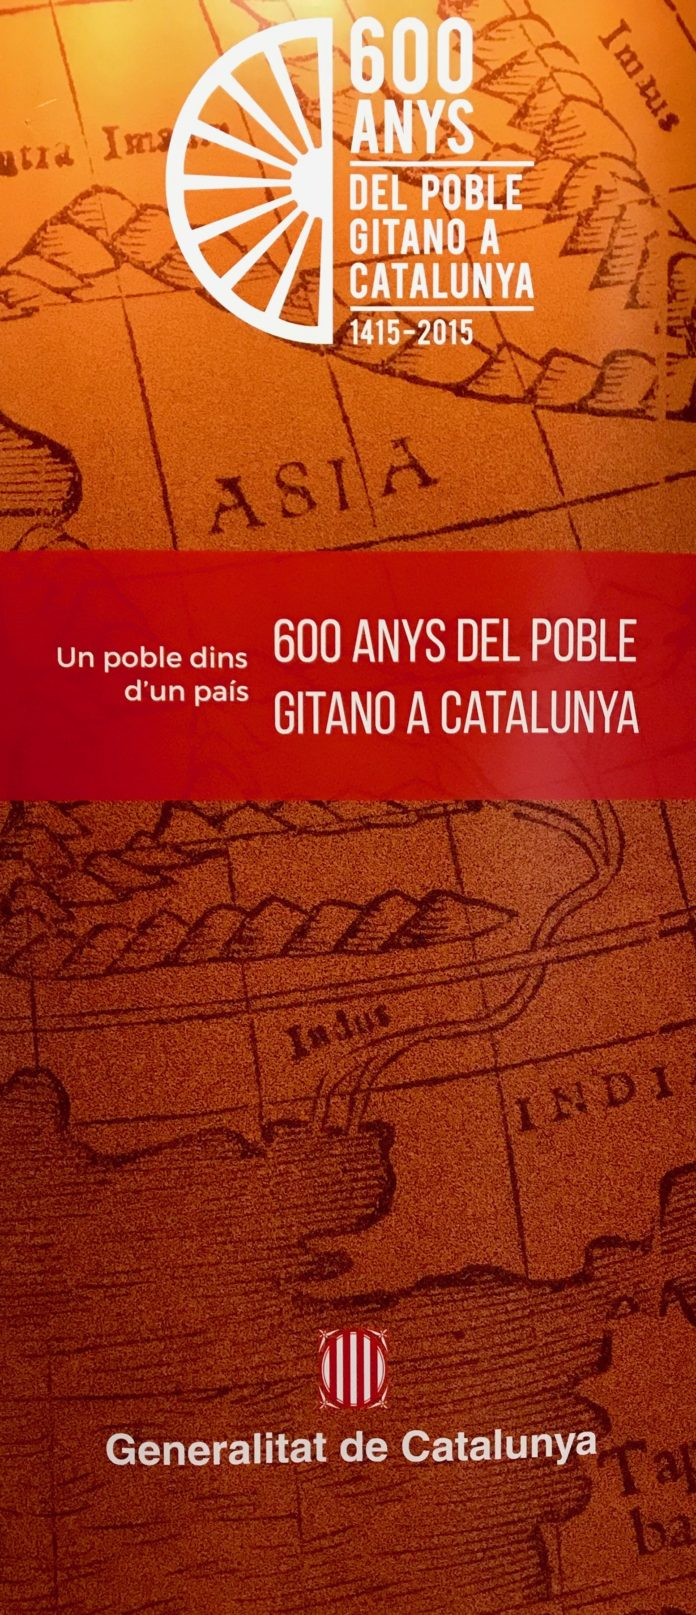 600 Anys del poble gitano a Catalunya